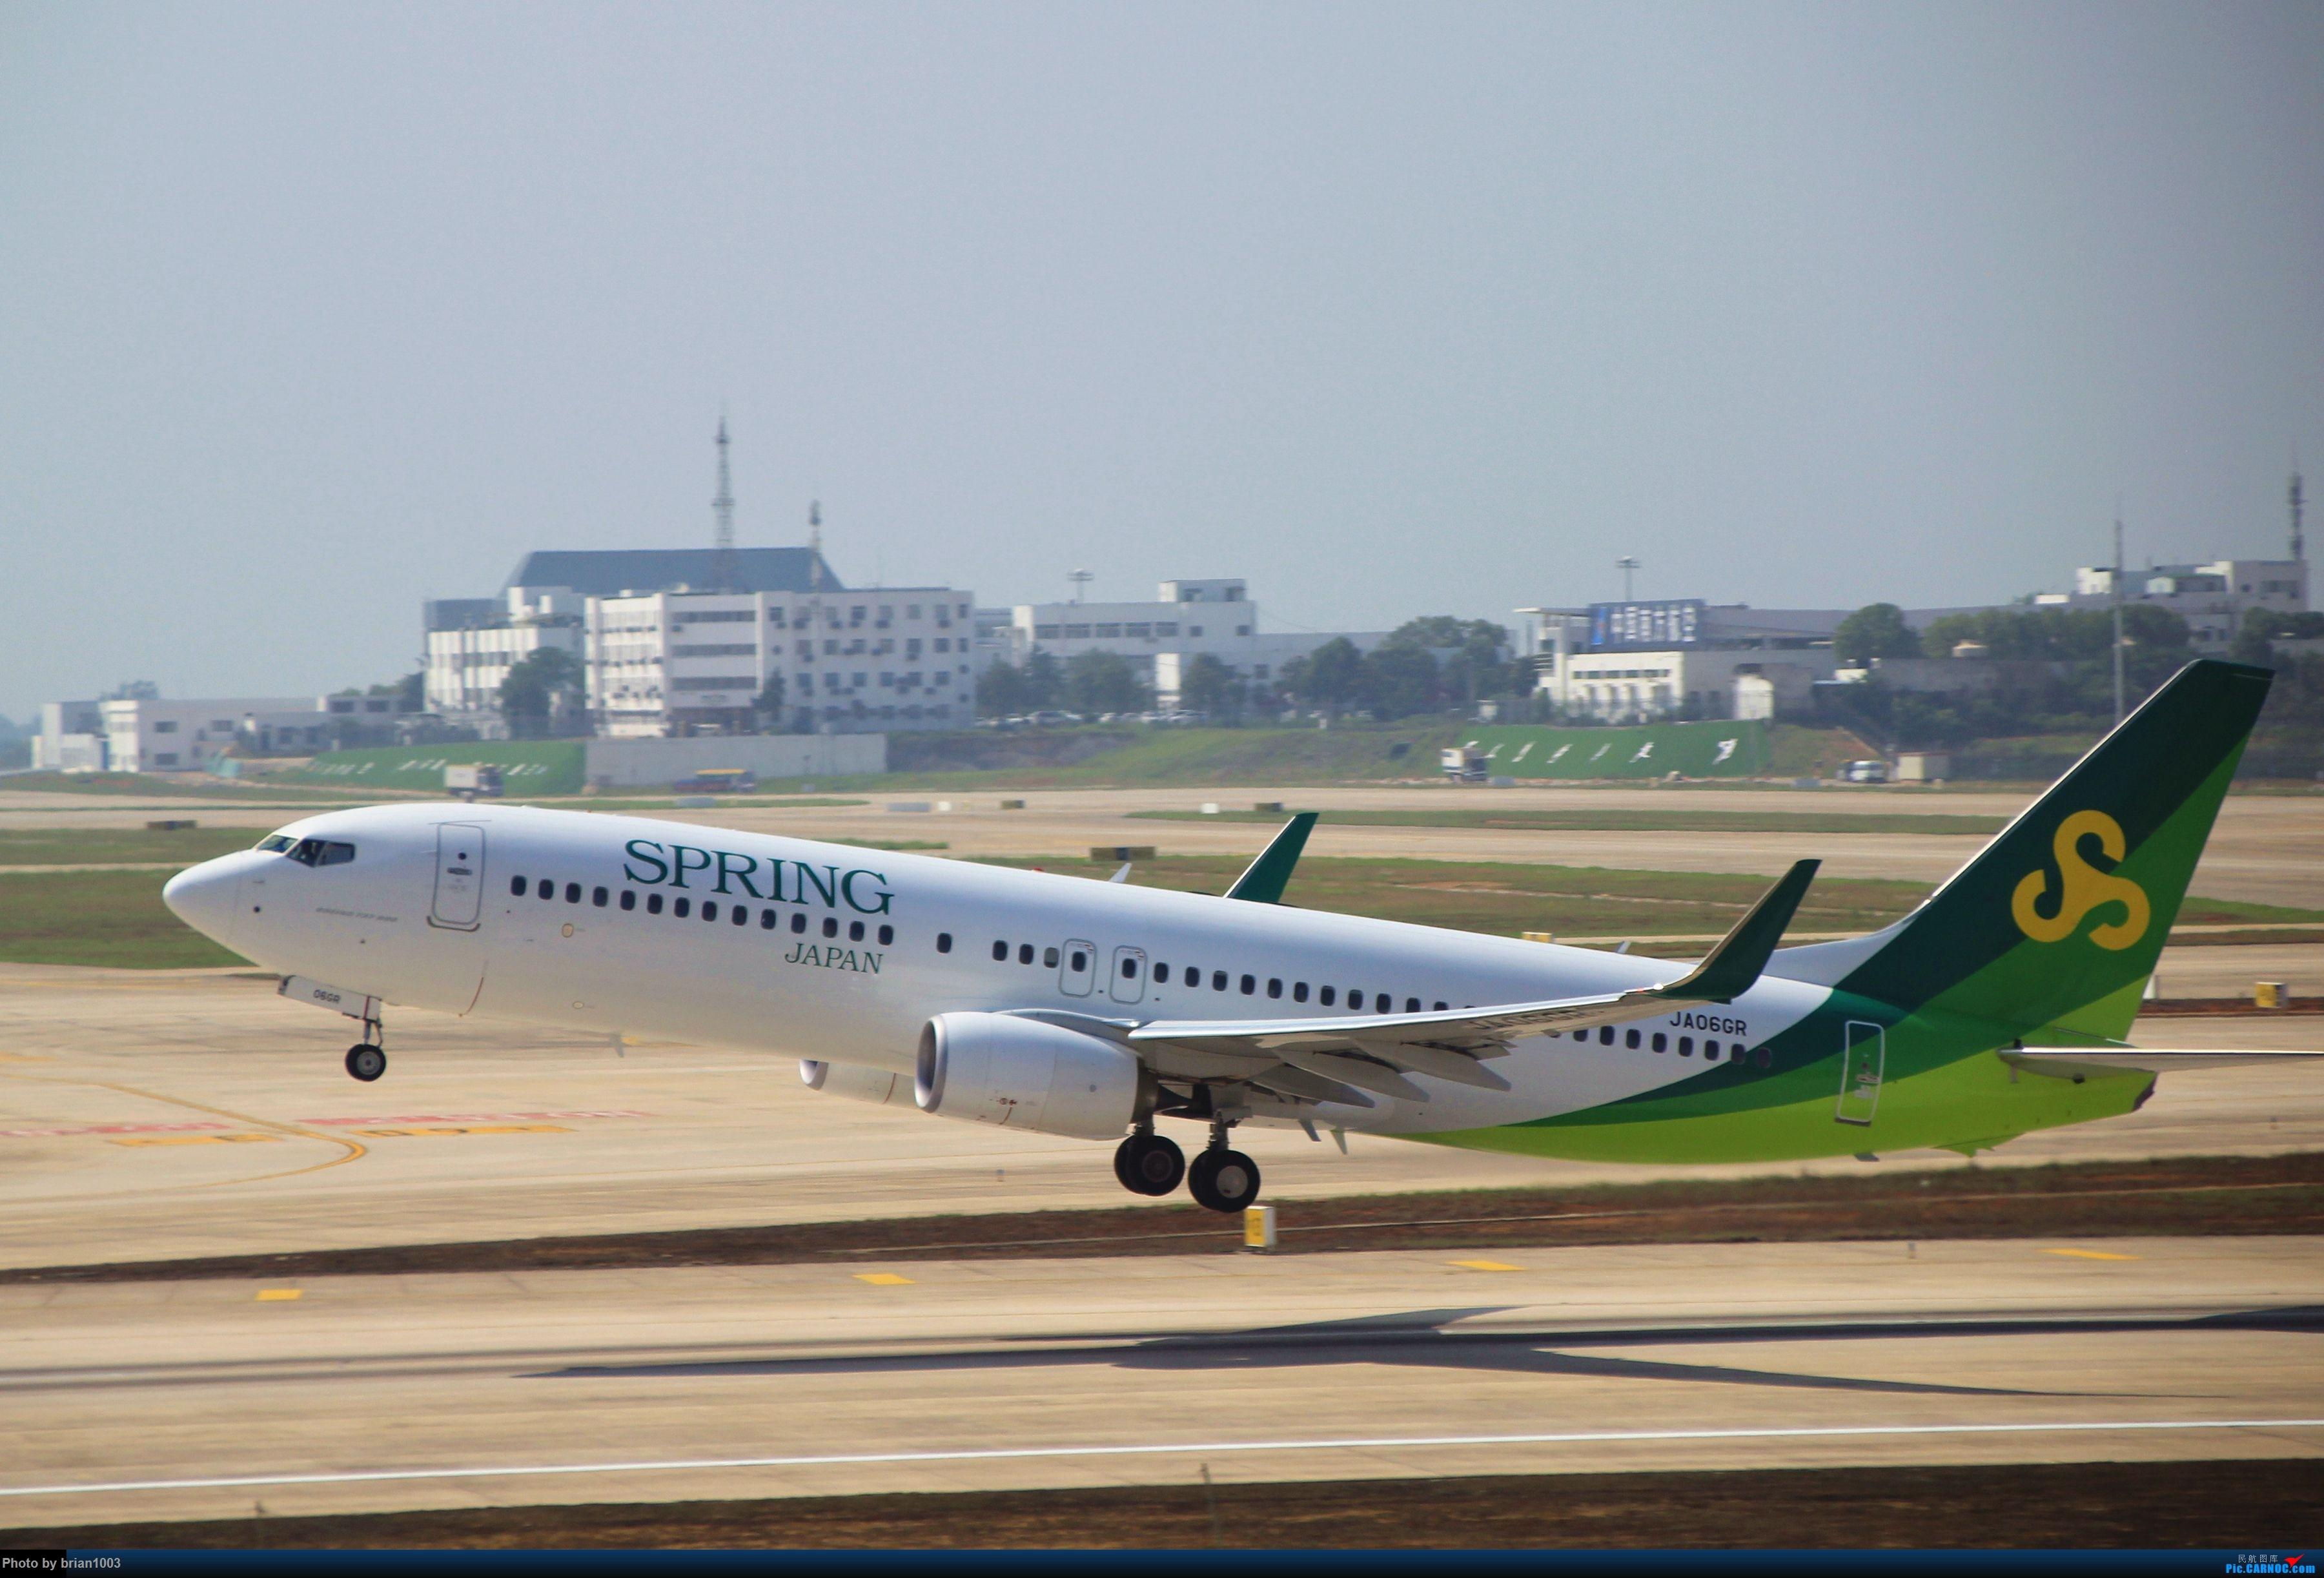 Re:[原创]WUH武汉天河机场拍机之喜迎酷航788和偶遇某其他飞机 BOEING 737-800 JA06GR